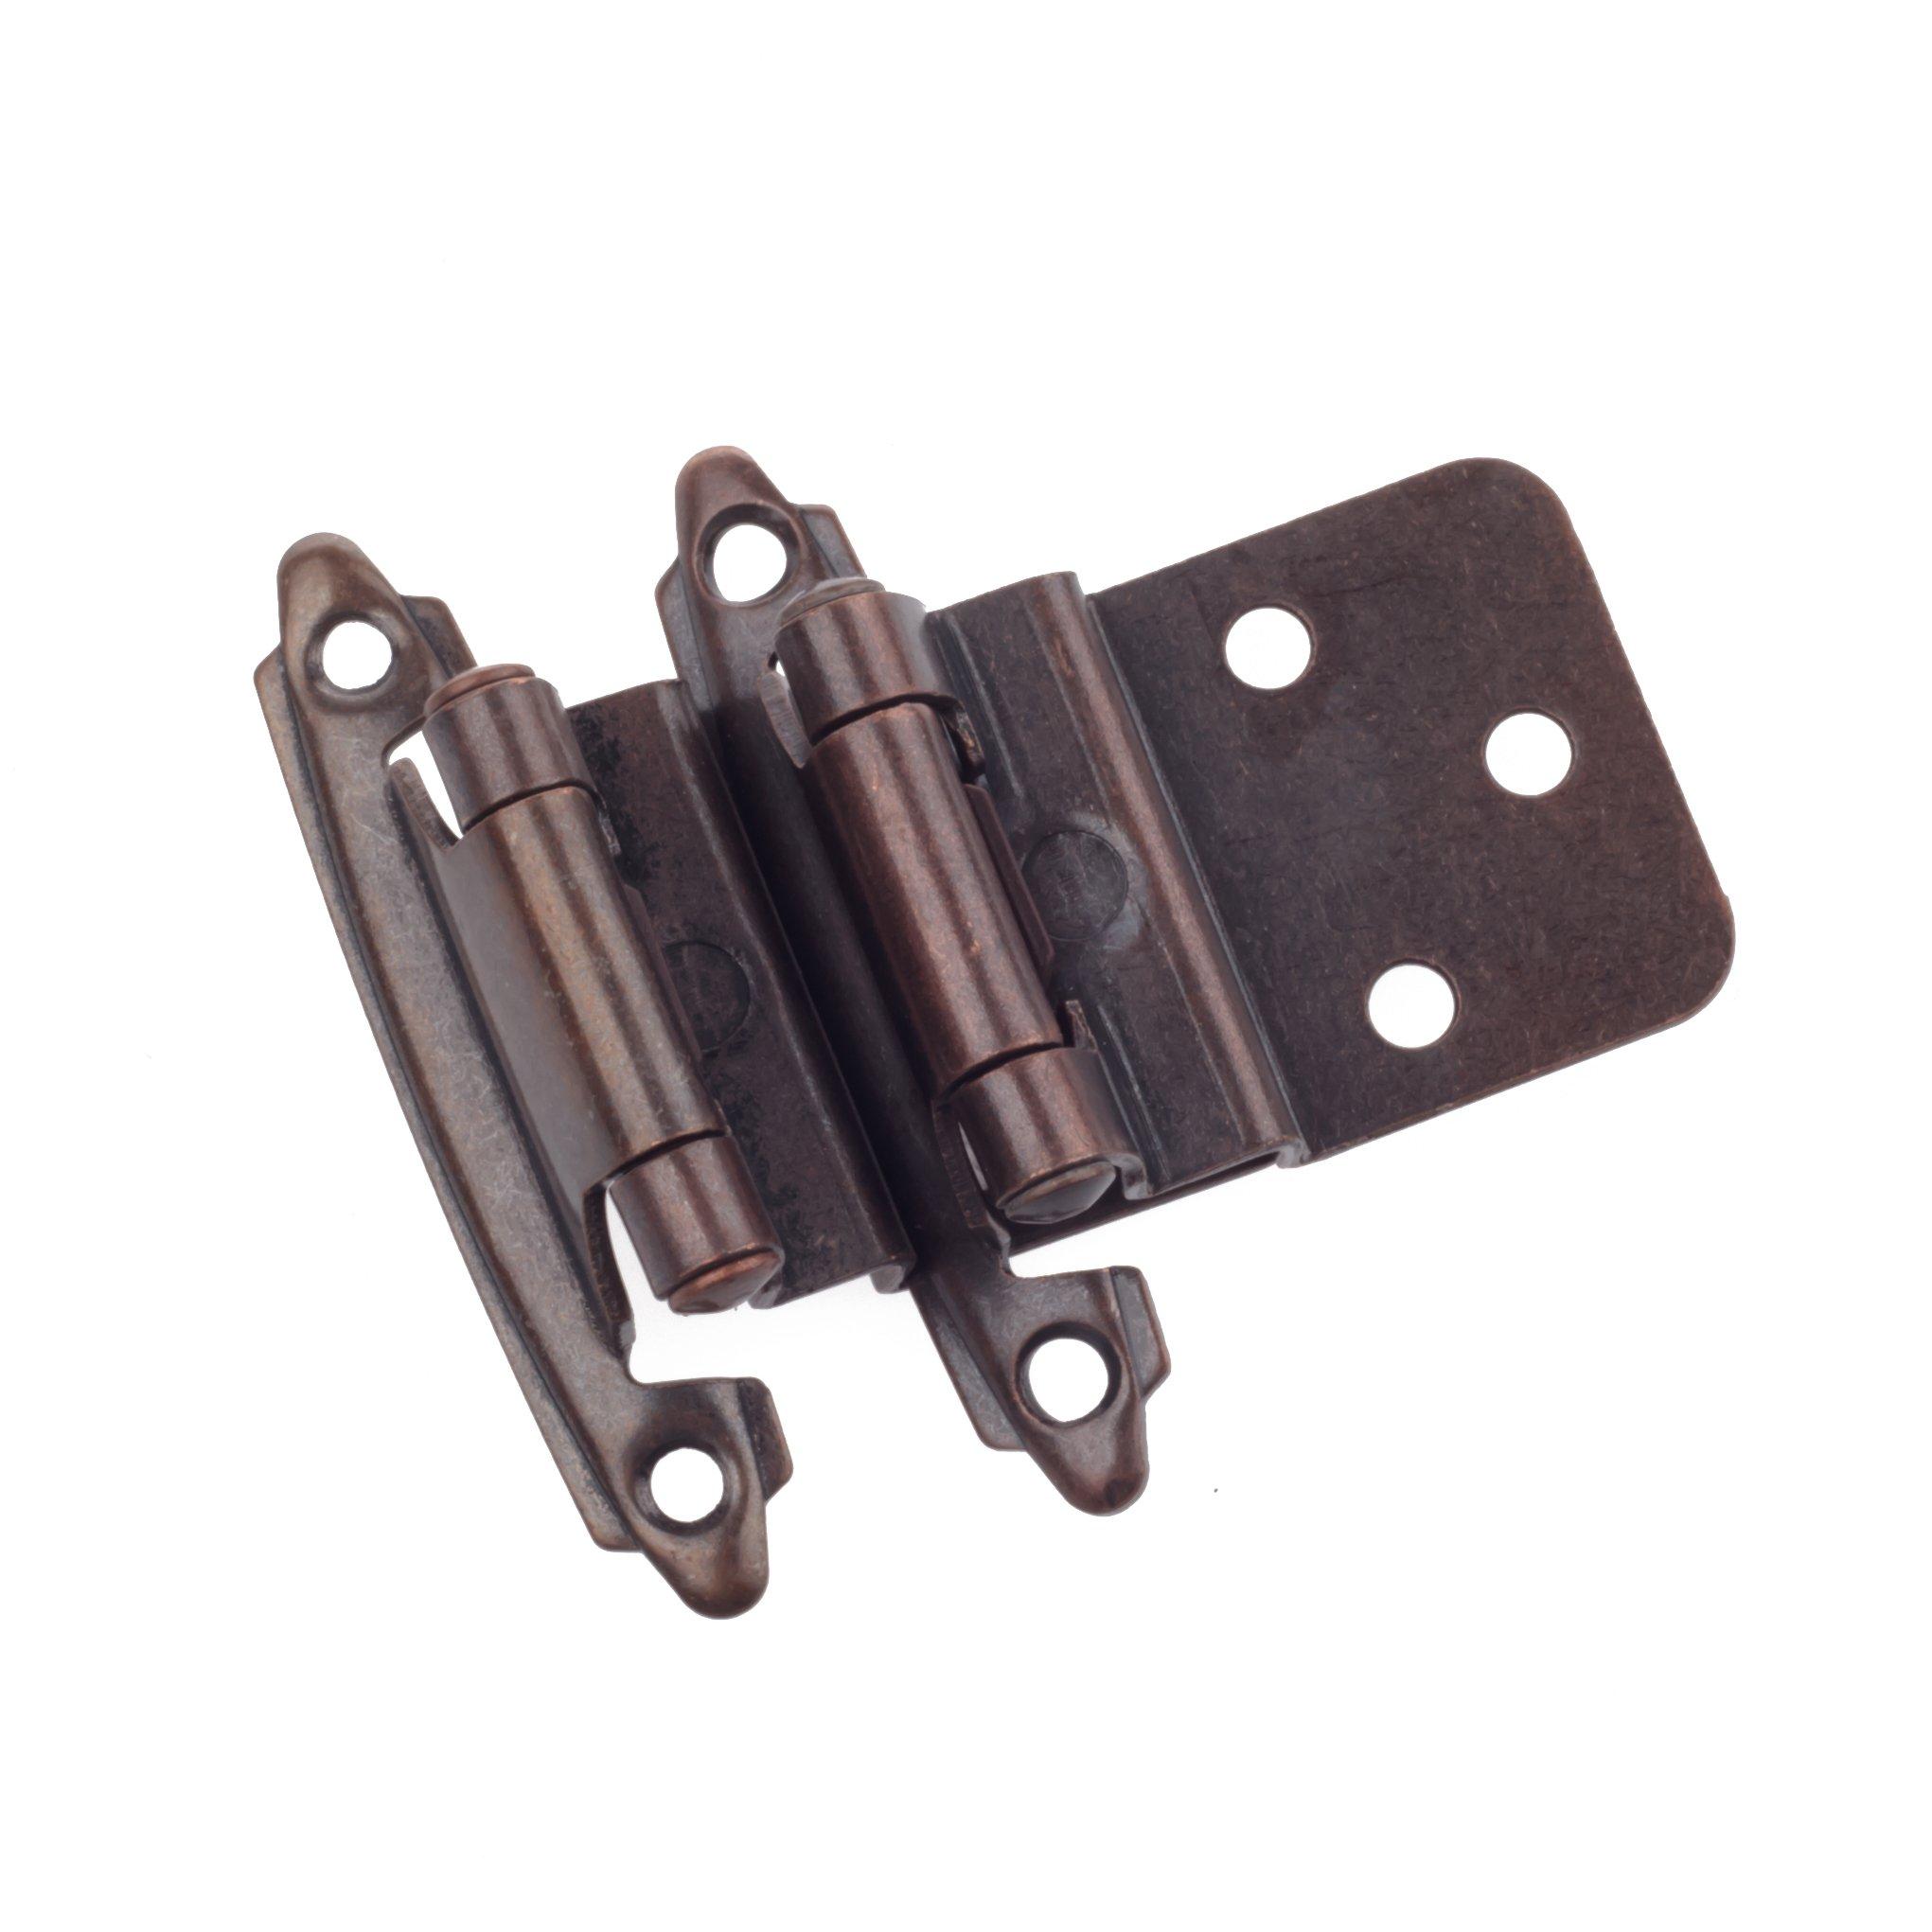 DecoBasics 3/8'' INSET Cabinet Hinge, Oil Brushed Bronze, 25 Pairs (Sets) Pack